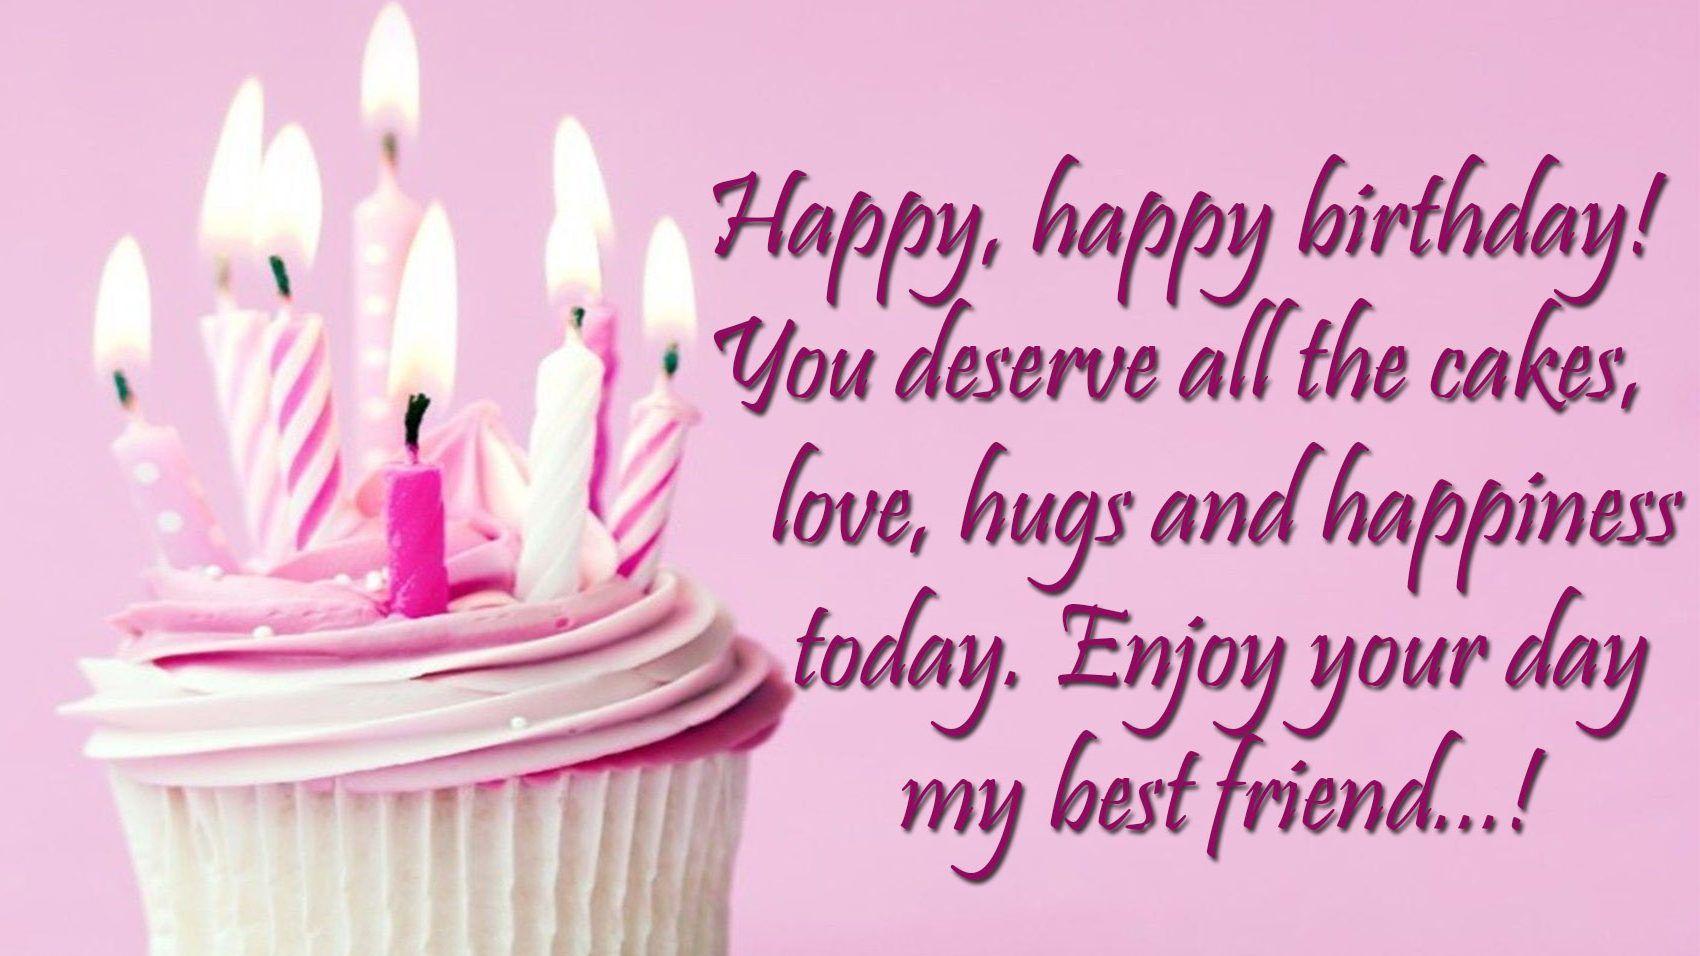 Happy Birthday Bestie Birthday Wishes For Best Friend Happy Birthday Bestie Birthday Wishes For Myself Free Happy Birthday Cards